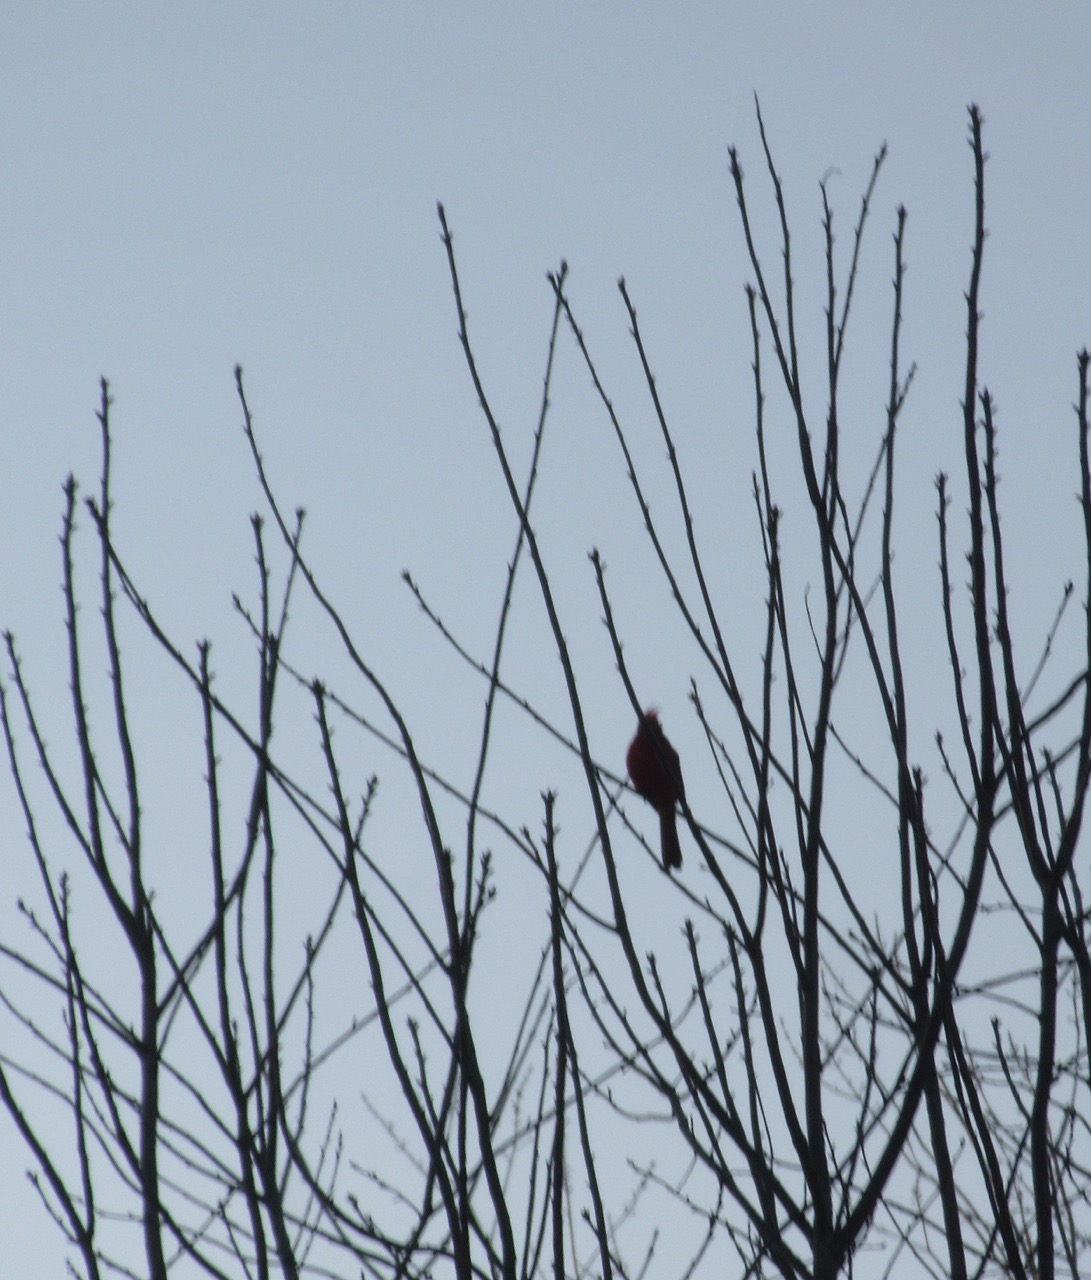 Cardinal with tufts